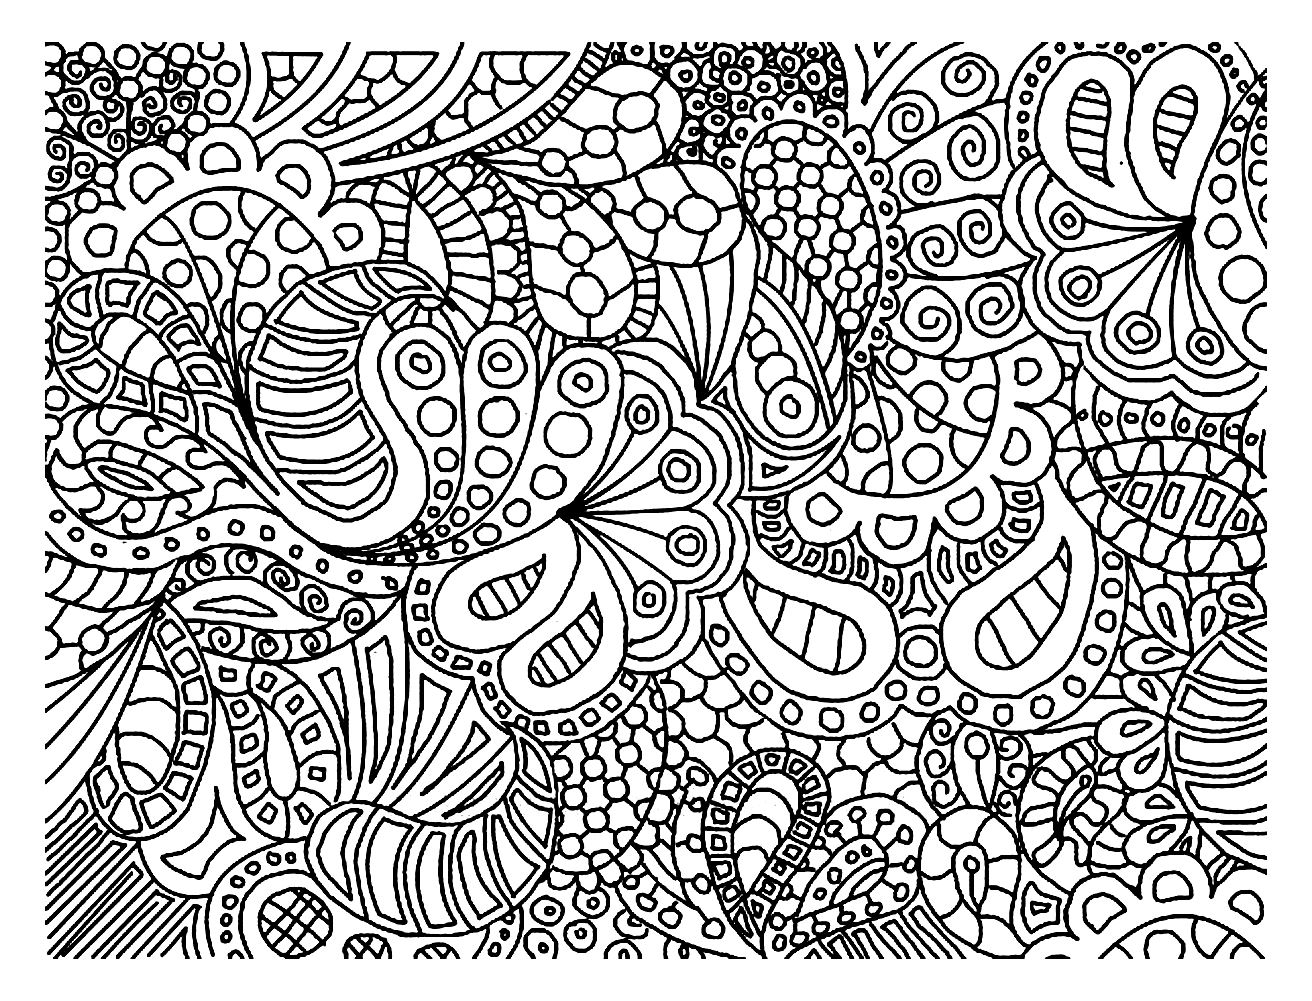 Disegni da colorare per adulti : Doodle art / Doodling - 16